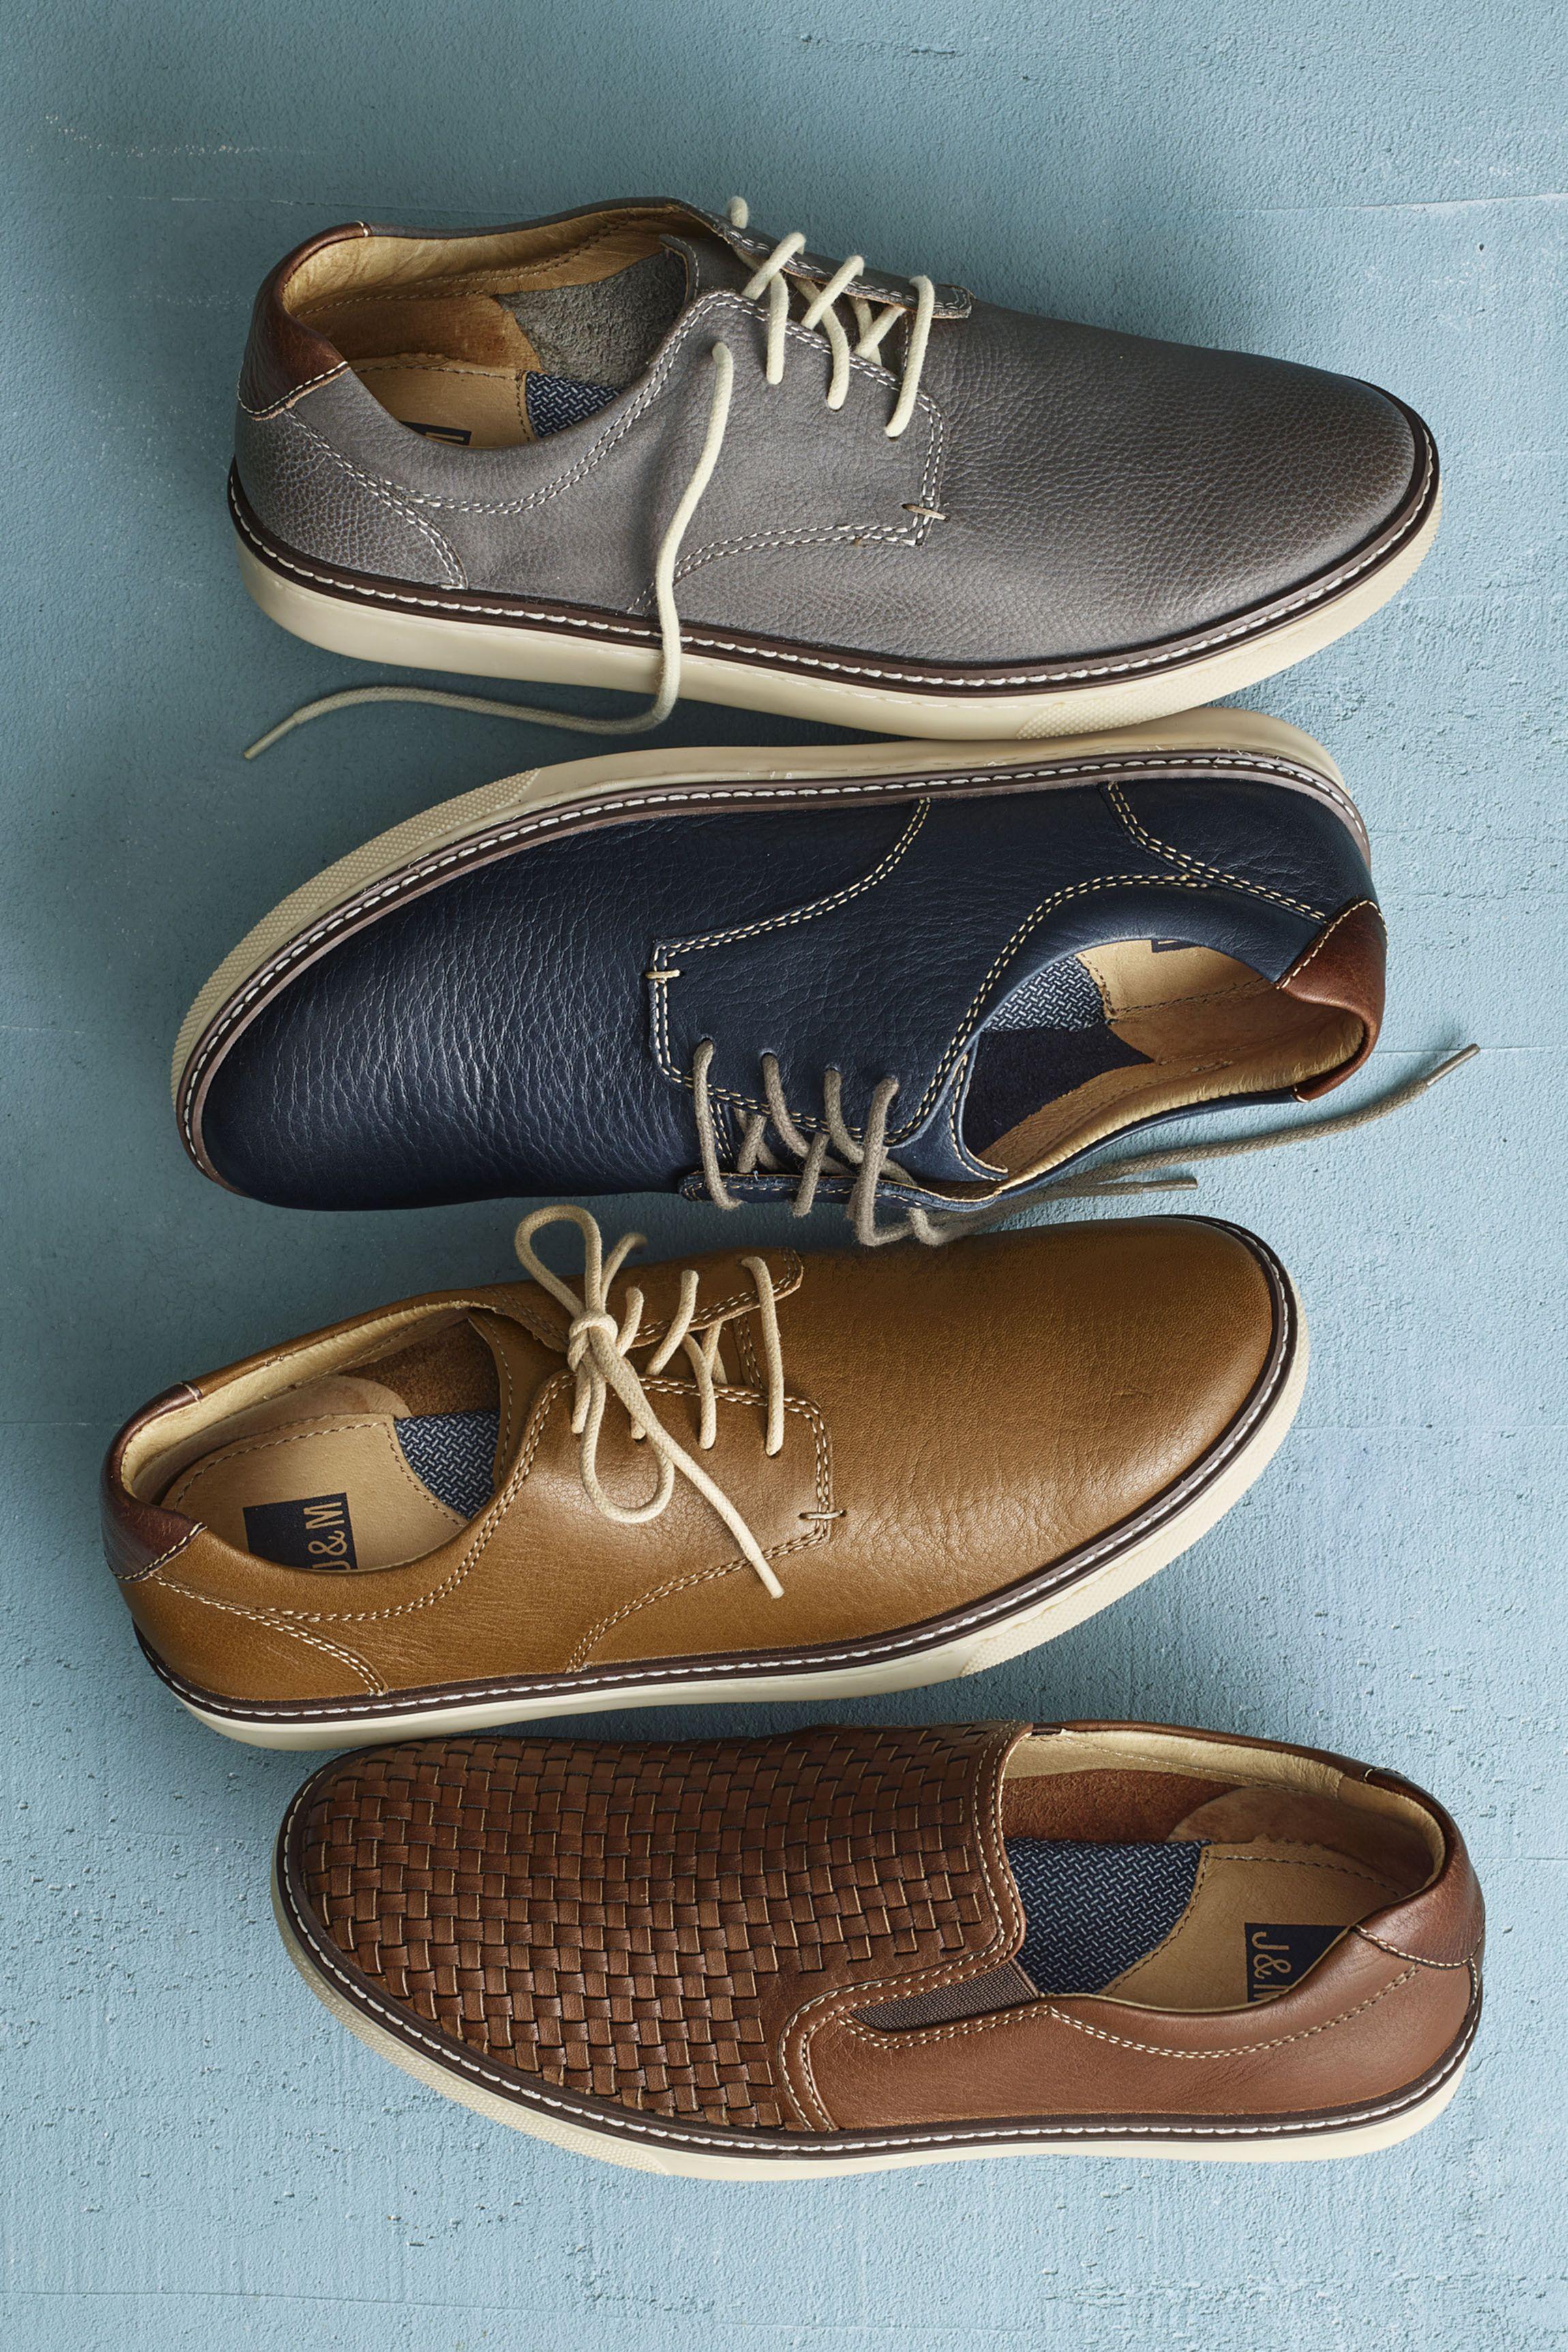 15 Best Men S Shoes Trend That Can Make You Cooler Mens Summer Shoes Best Shoes For Men Mens Fashion Shoes [ 3450 x 2300 Pixel ]